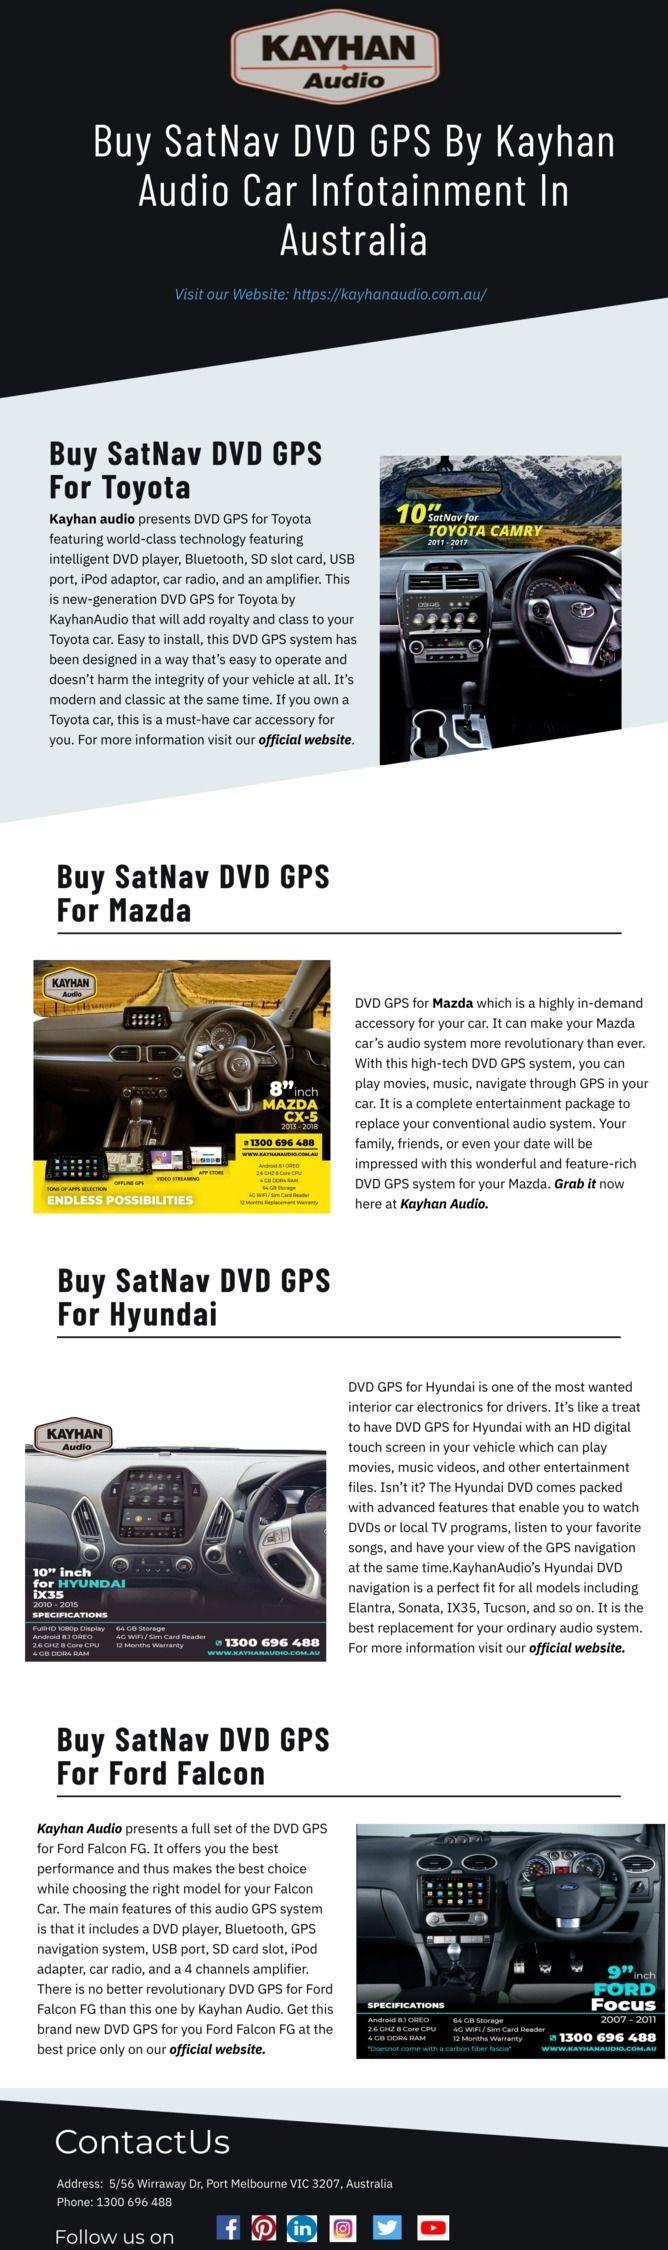 Buy GPS Navigation System Vehic - kayhanaudio | ello